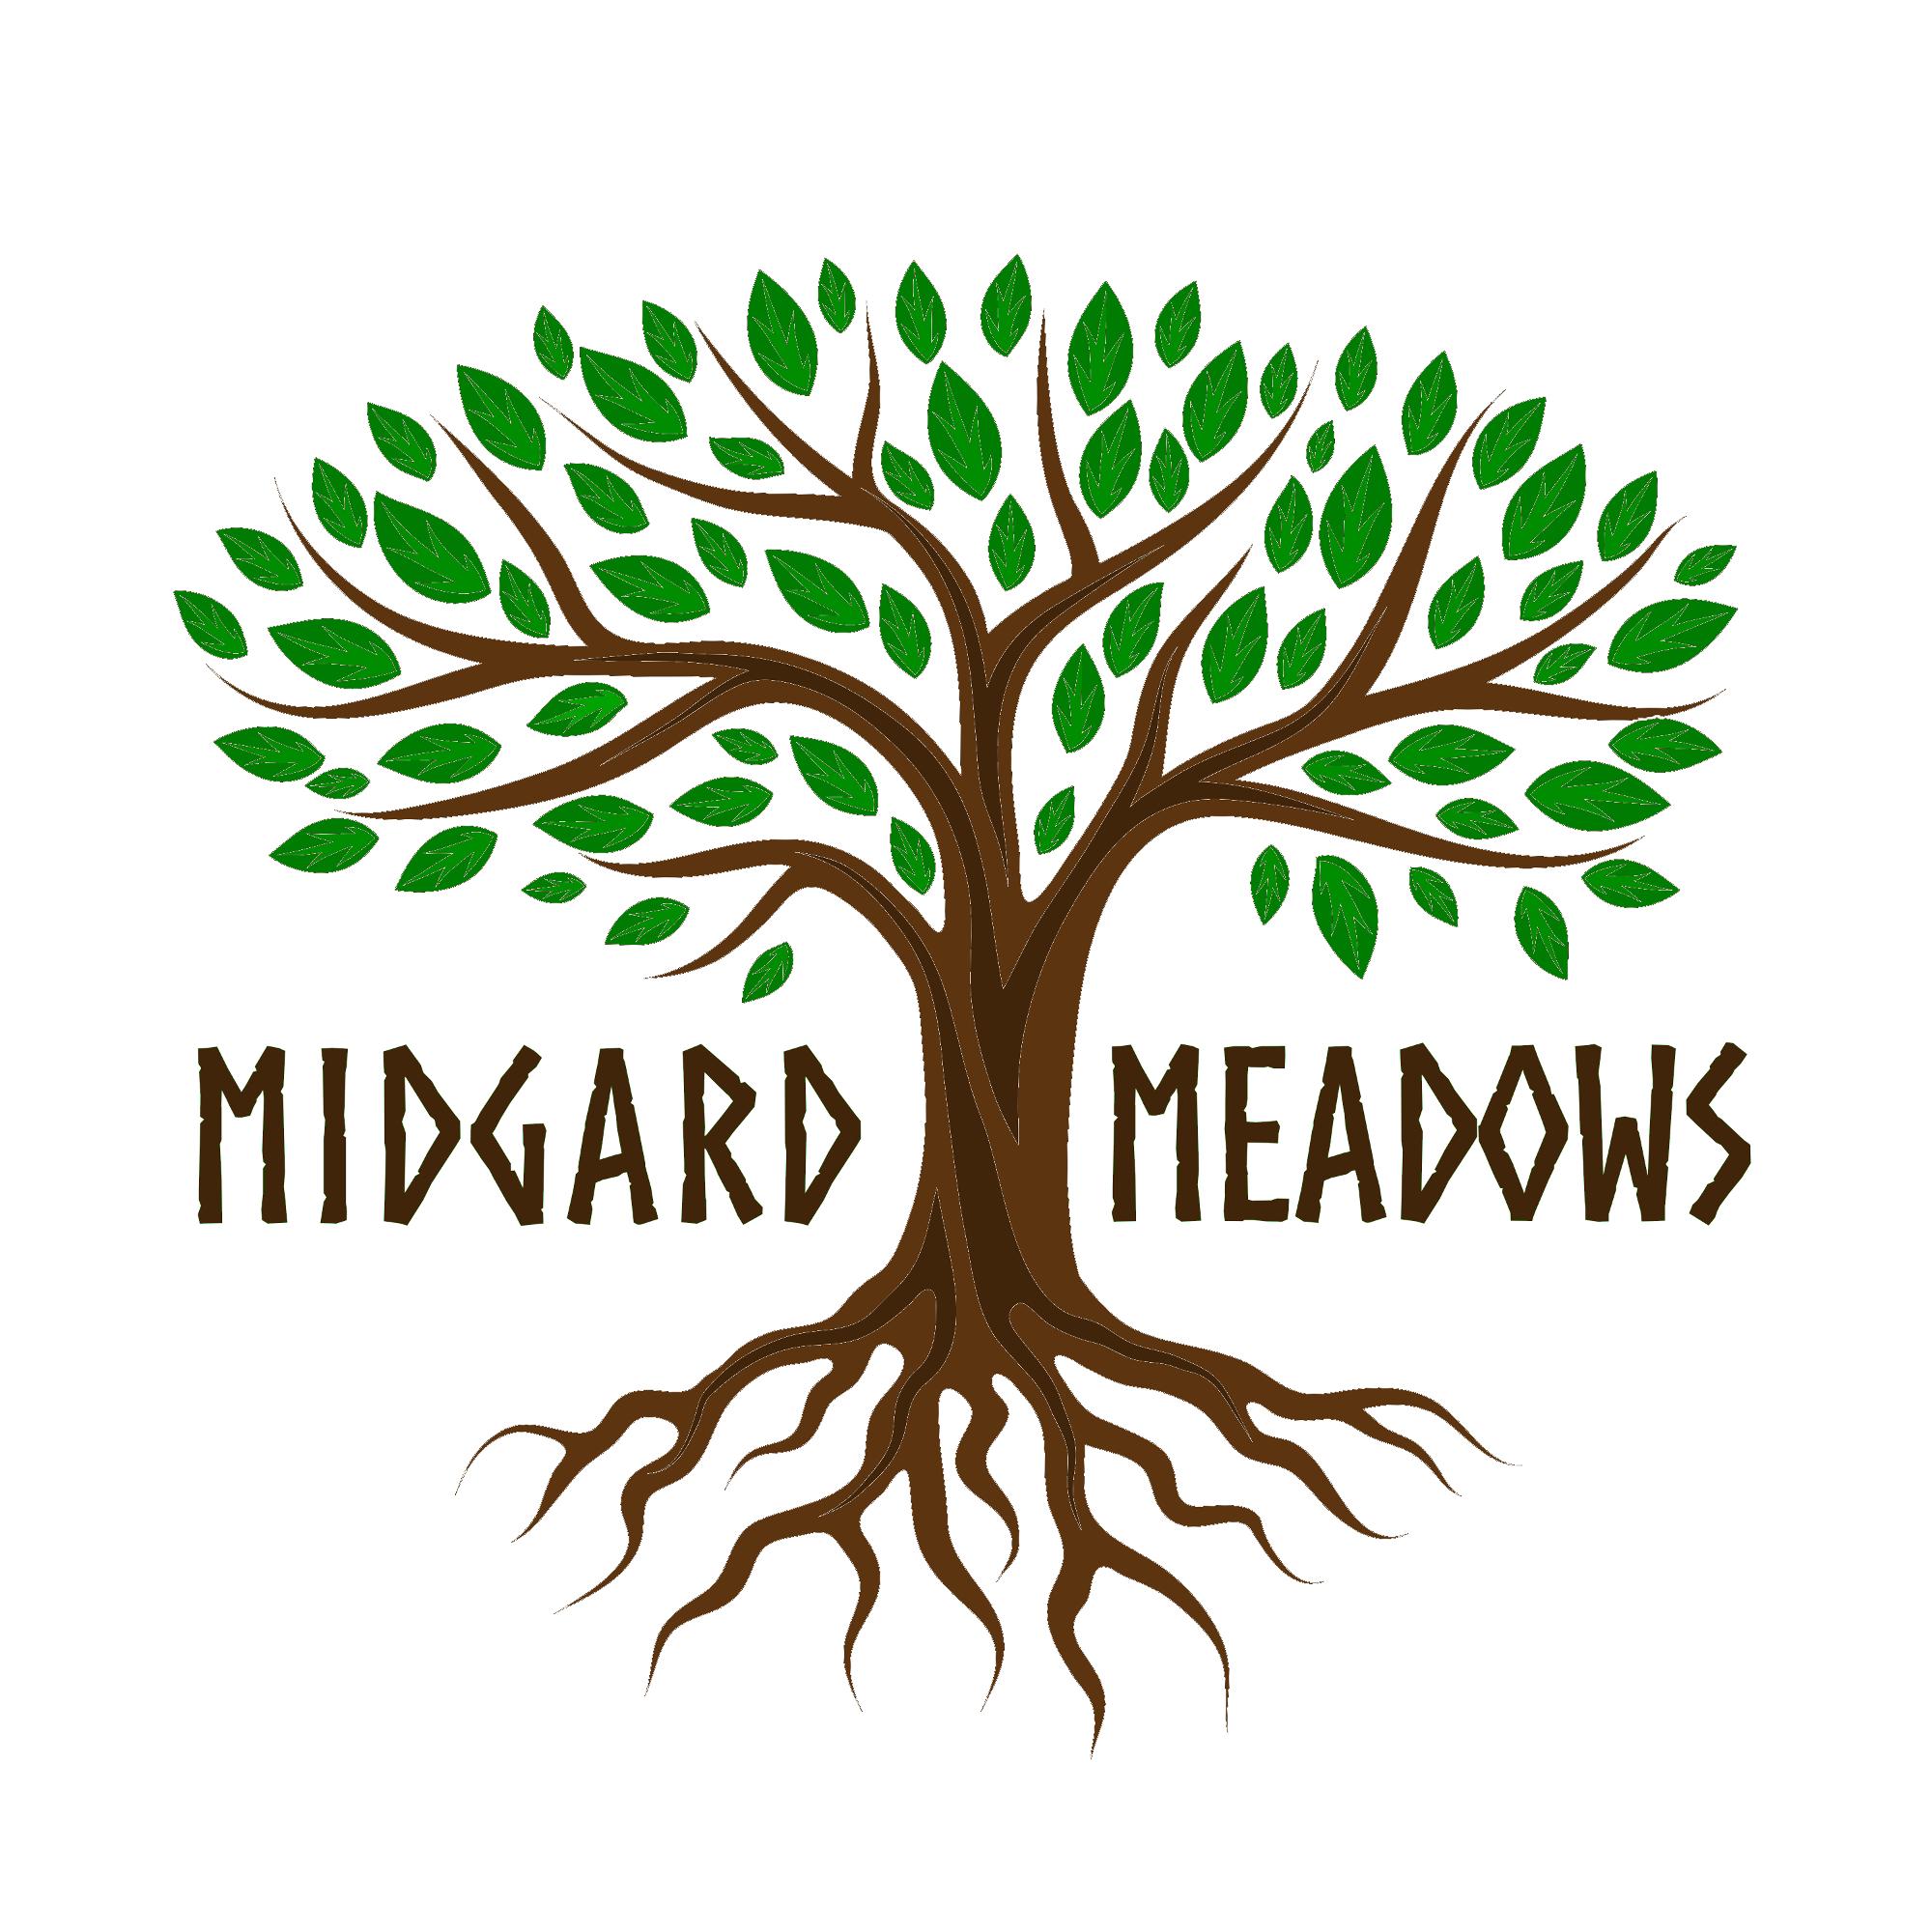 Midgard Meadows